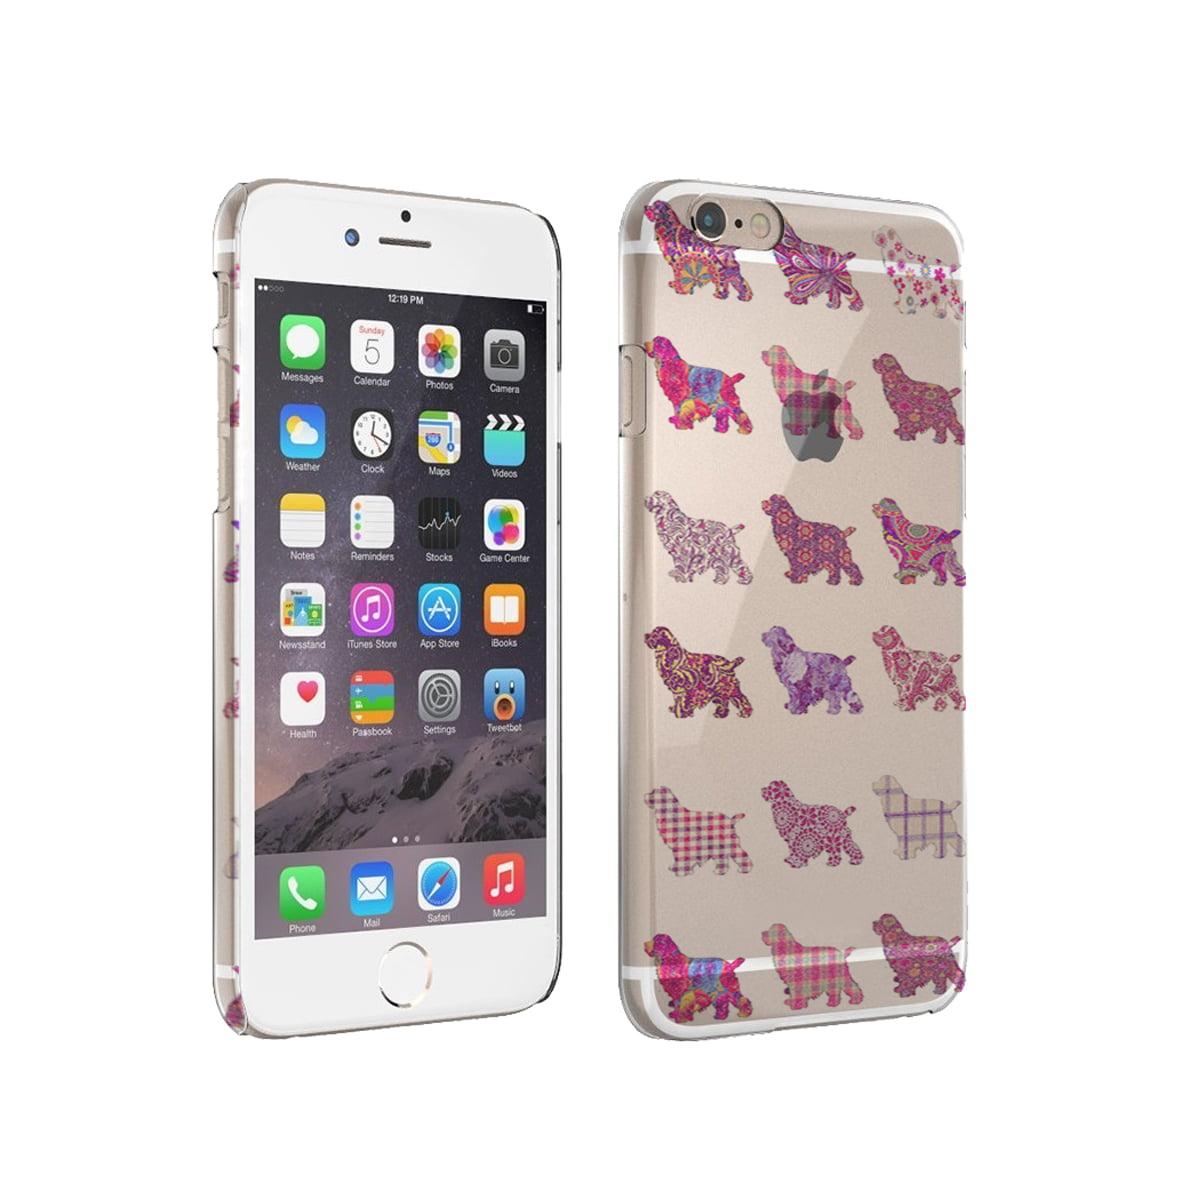 KuzmarK iPhone 6 Clear Cover Case - Cocker Spaniel Dog